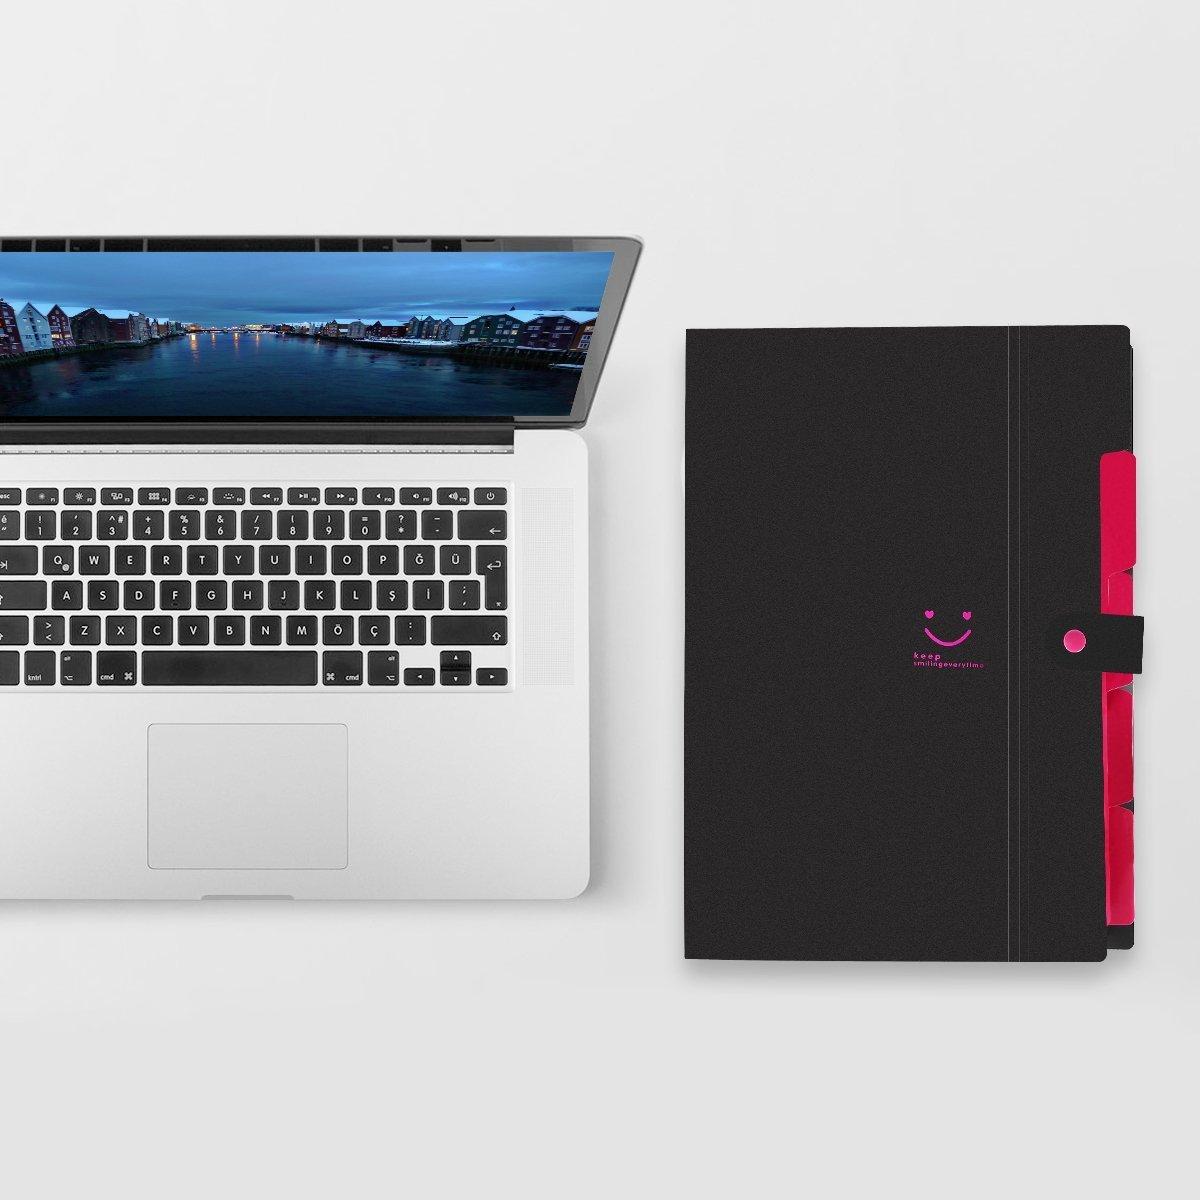 ed37ea337aac Expanding File Folder 12 Pockets with Snap Closure 1617 EU Portable ...